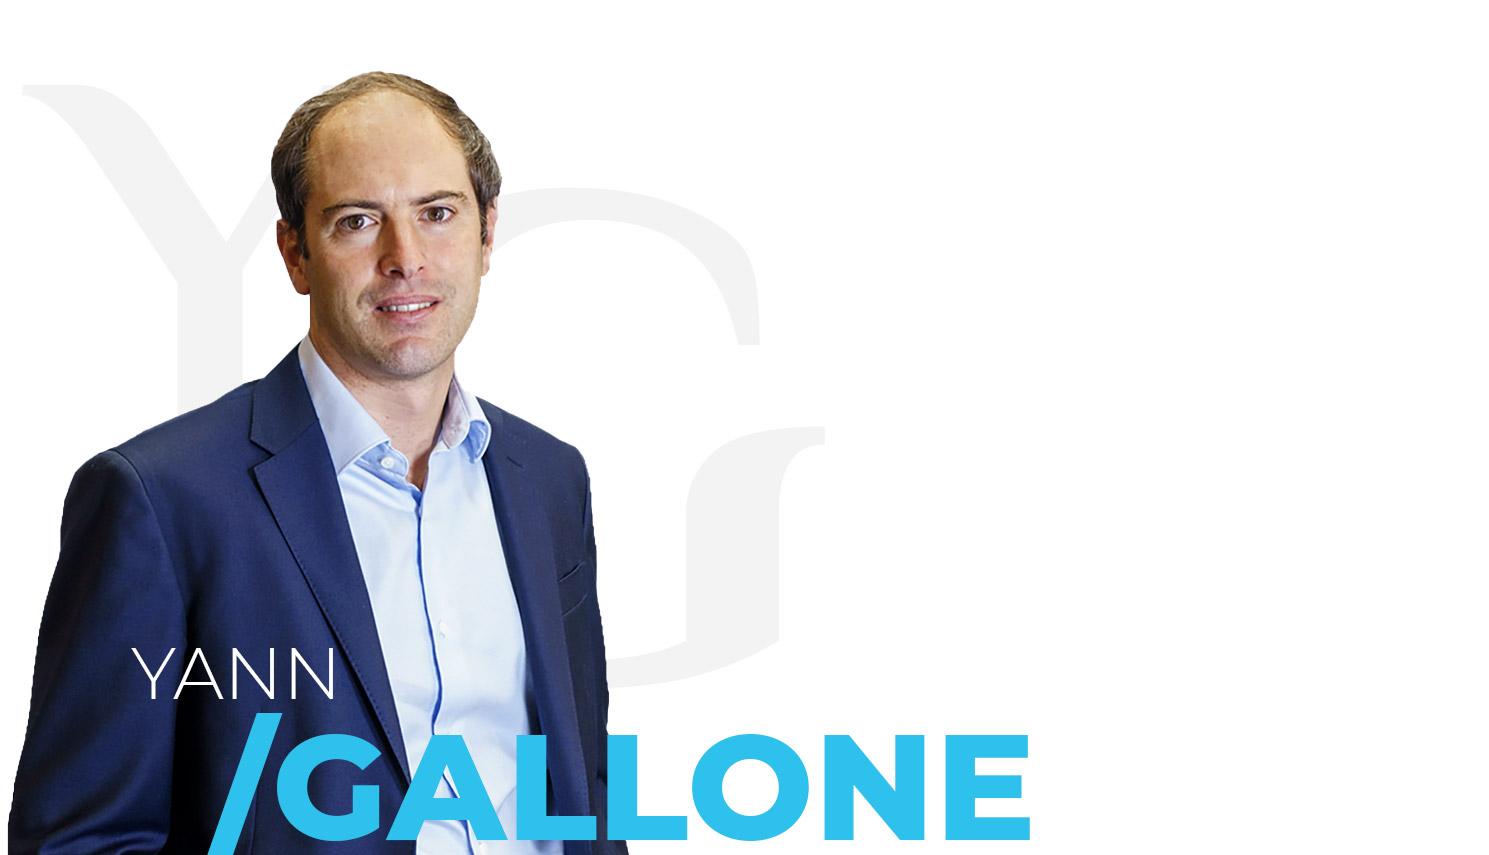 Yann GALLONE